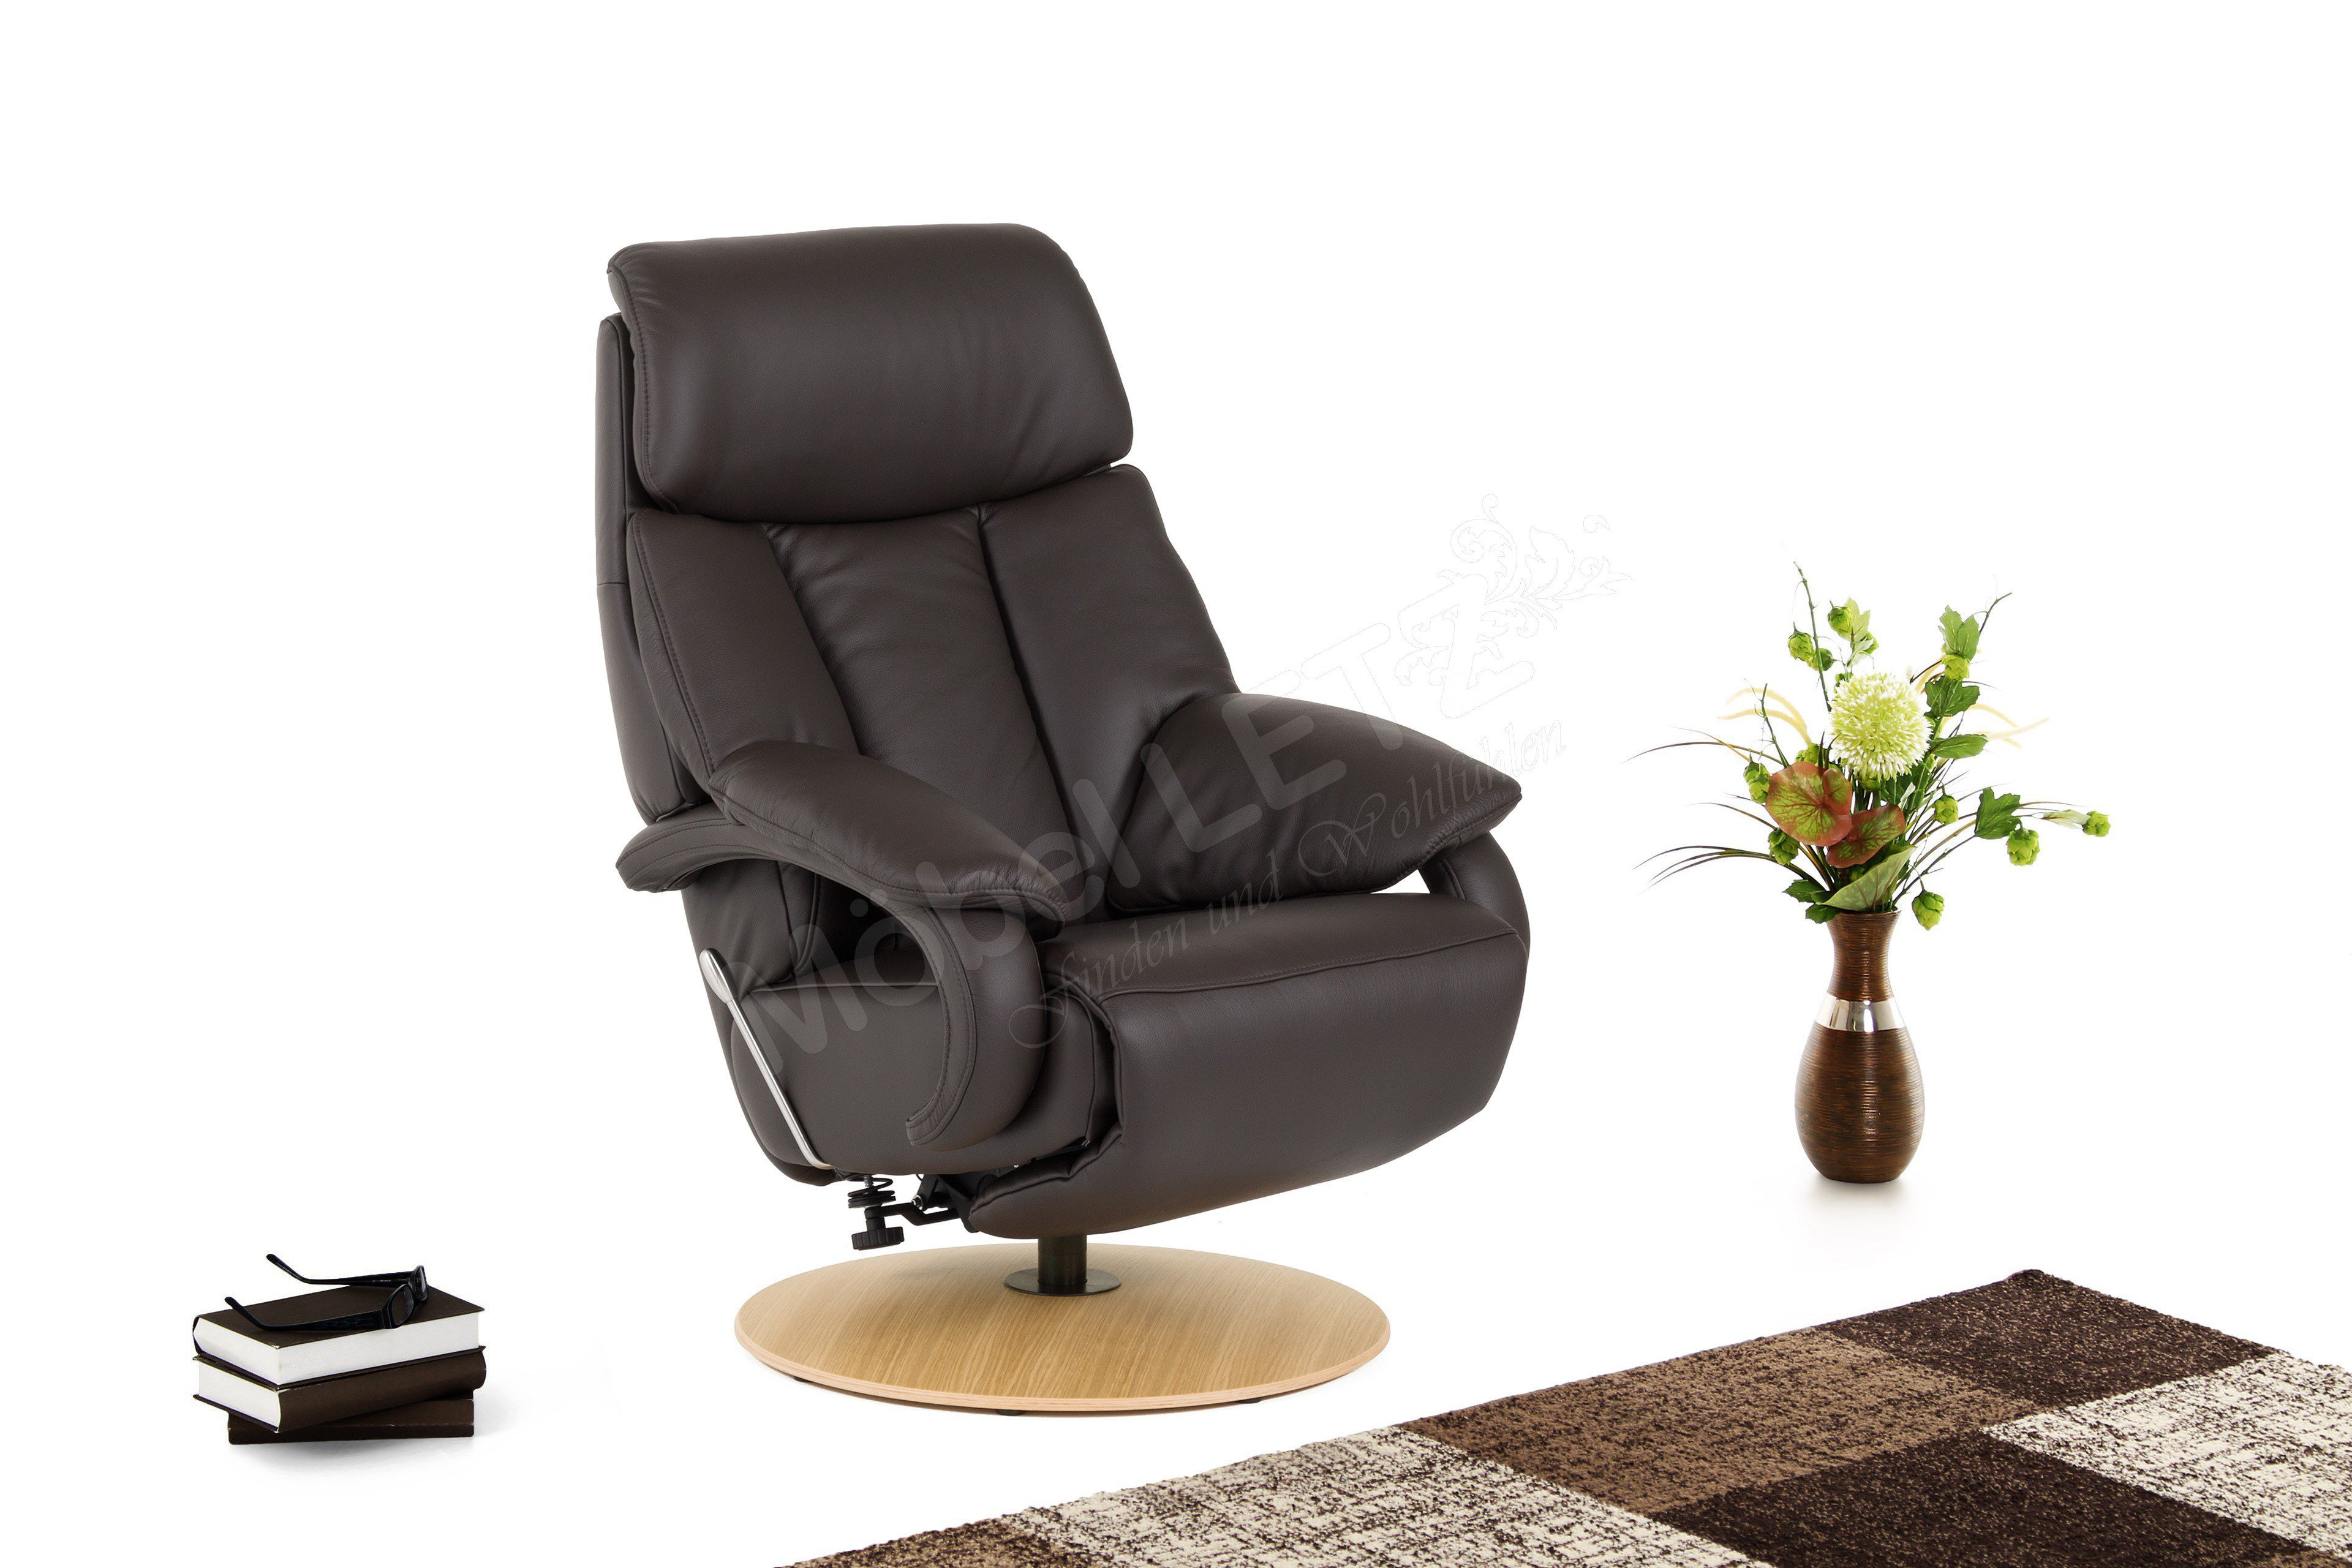 hukla cosyrelax cr 04 relaxsessel in braun m bel letz. Black Bedroom Furniture Sets. Home Design Ideas